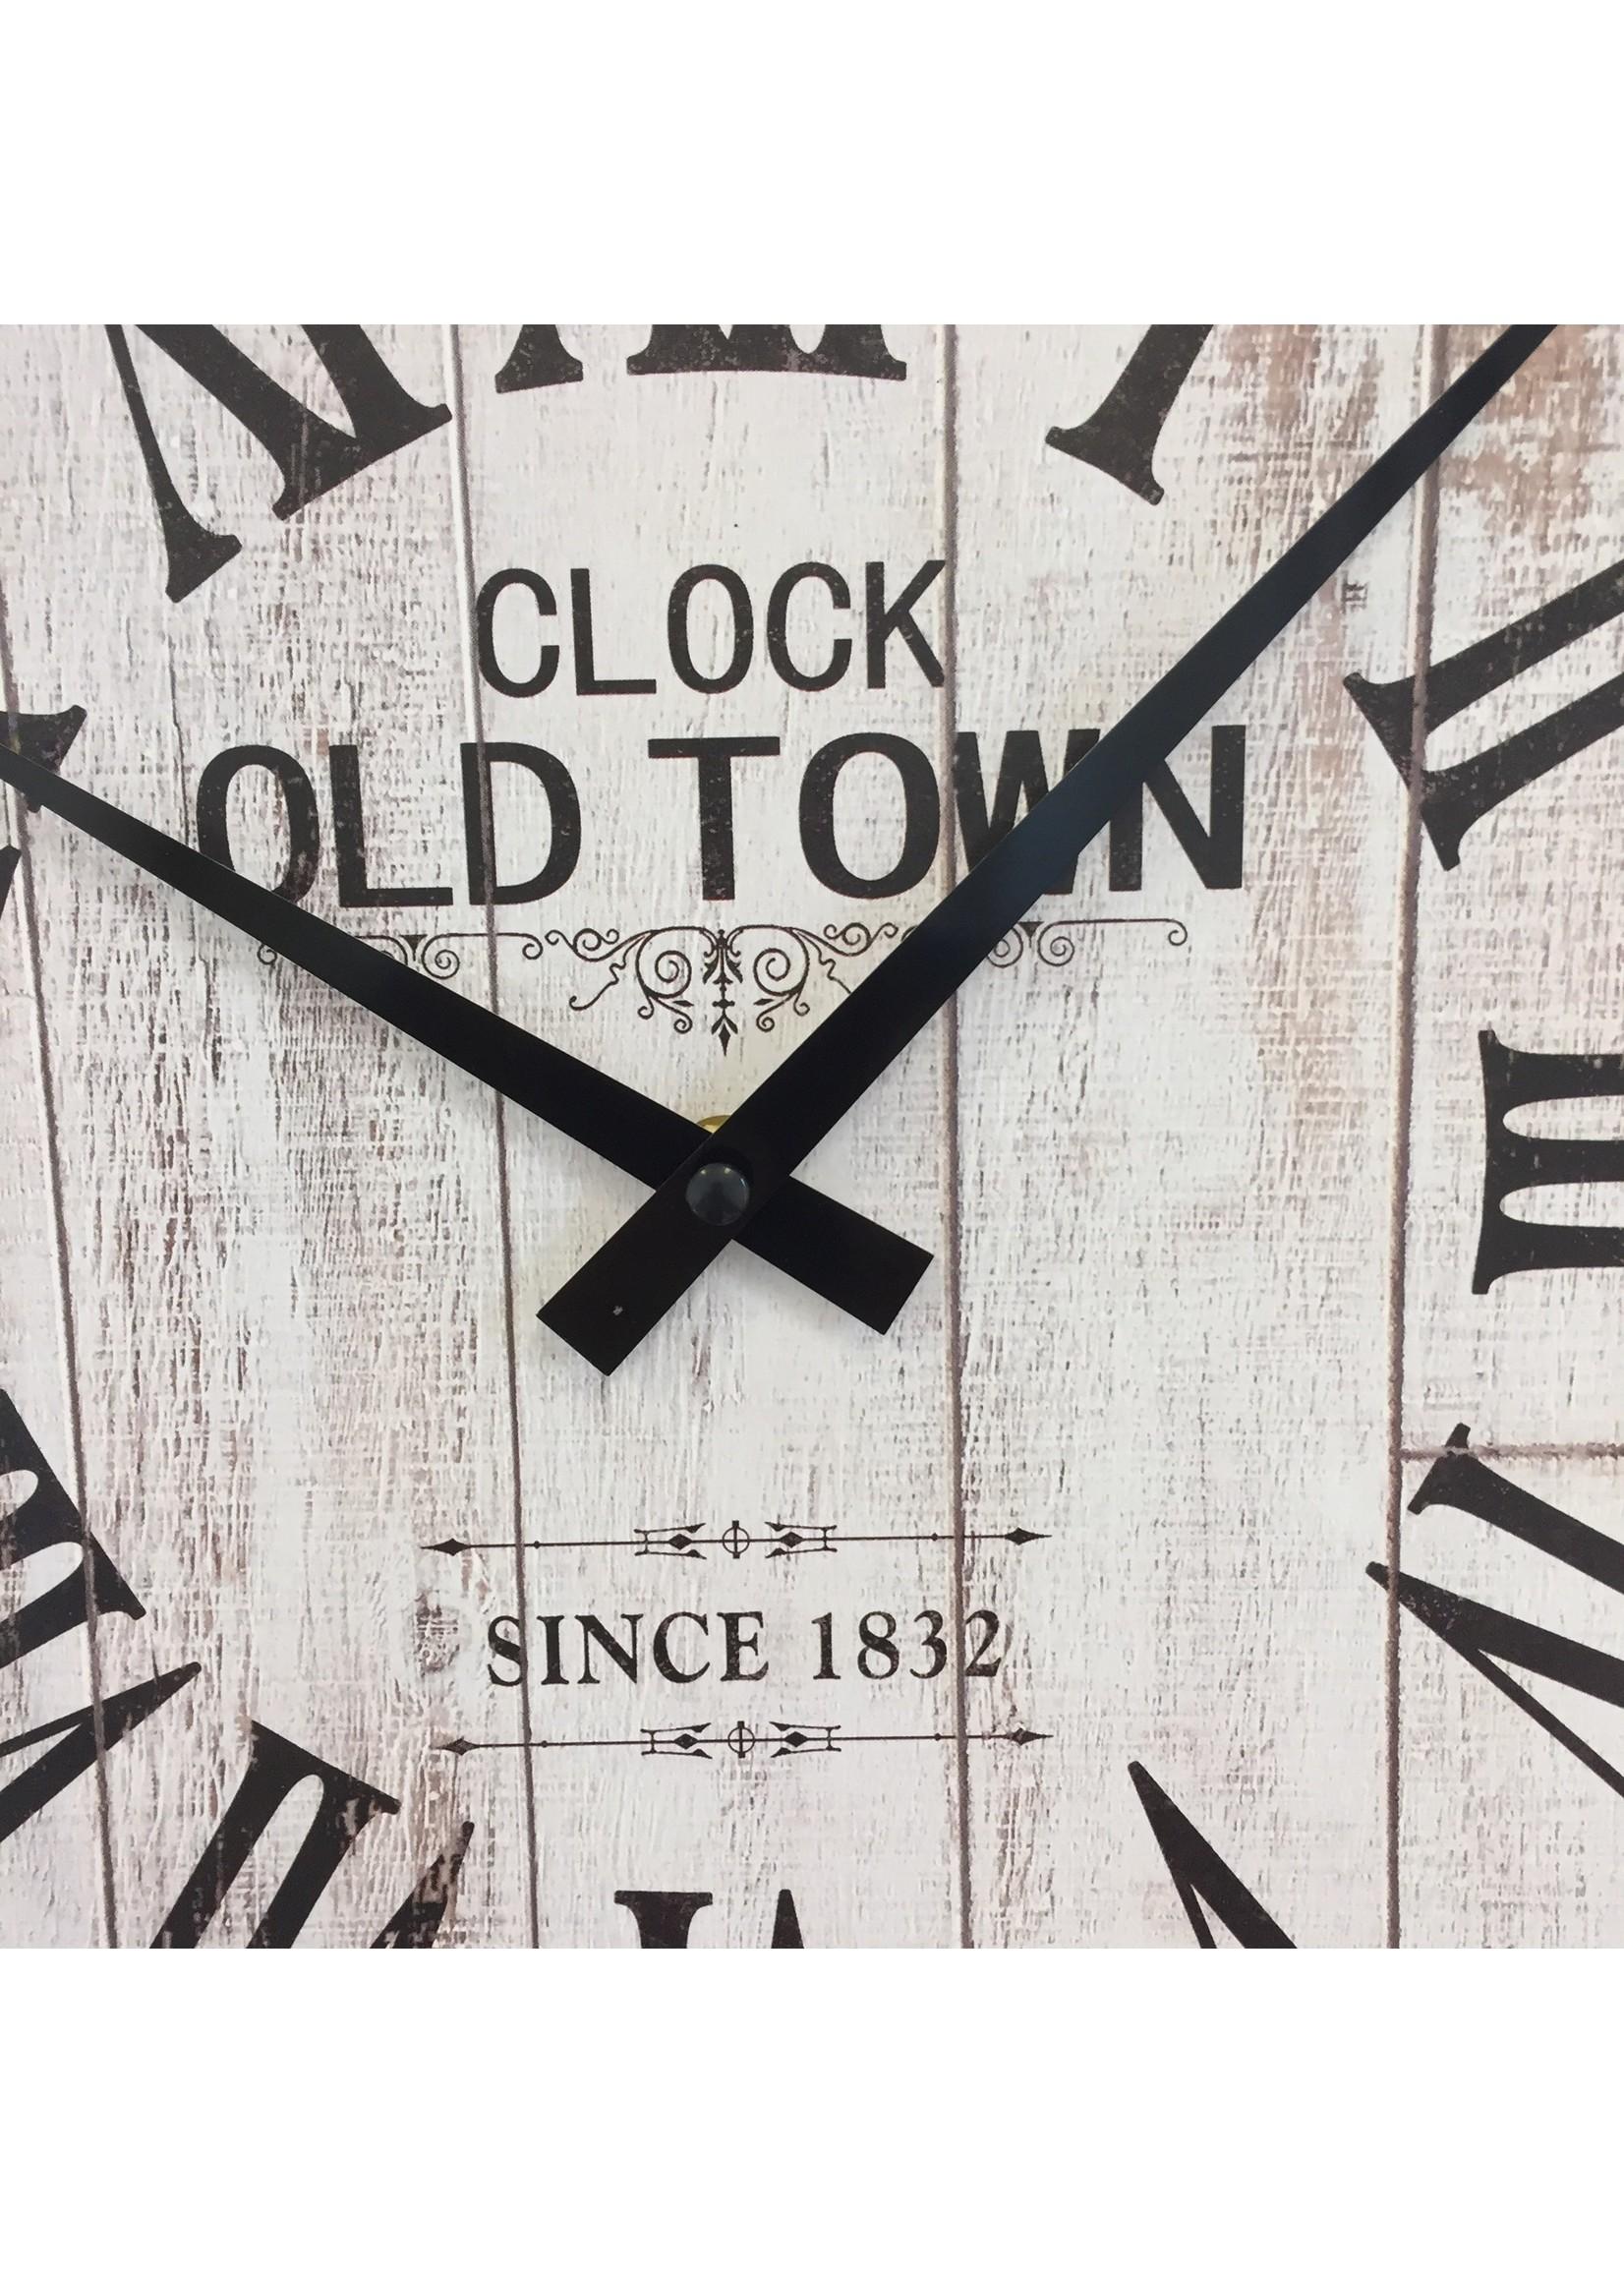 NiceTime Wandklok OLD TOWN 1832 Vintage RETRO